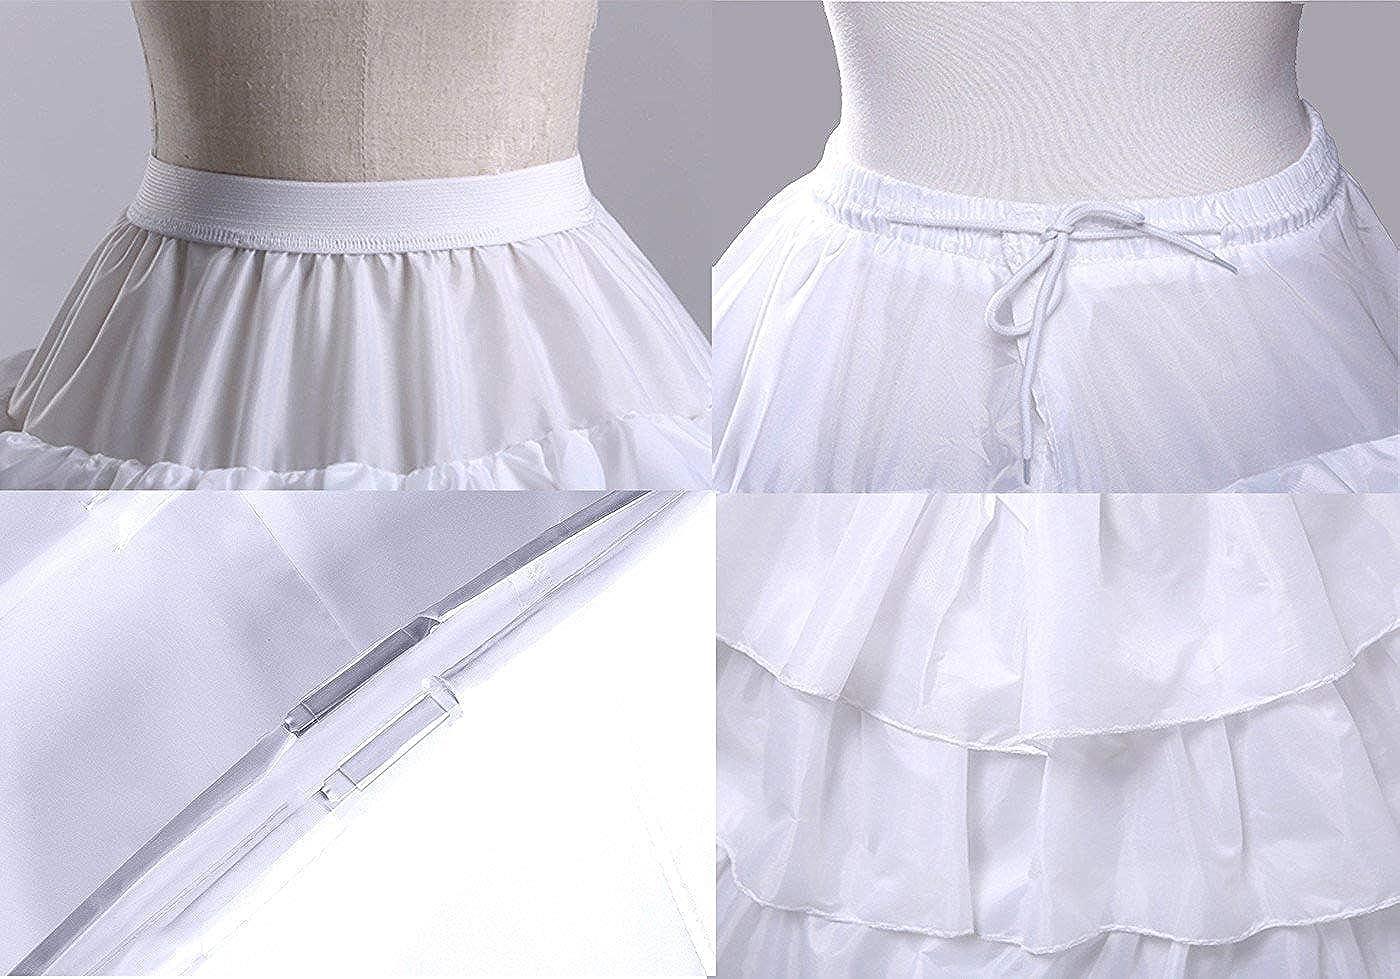 FuliMall Reifrock Petticoat Unterrock Petticoat Reifrock 4 Ring 5 Flouncing Hochzeit Petticoat Brautkleider Reifrock Krinoline Petticoat Unterrock f/ür Brautkleid Petticoat